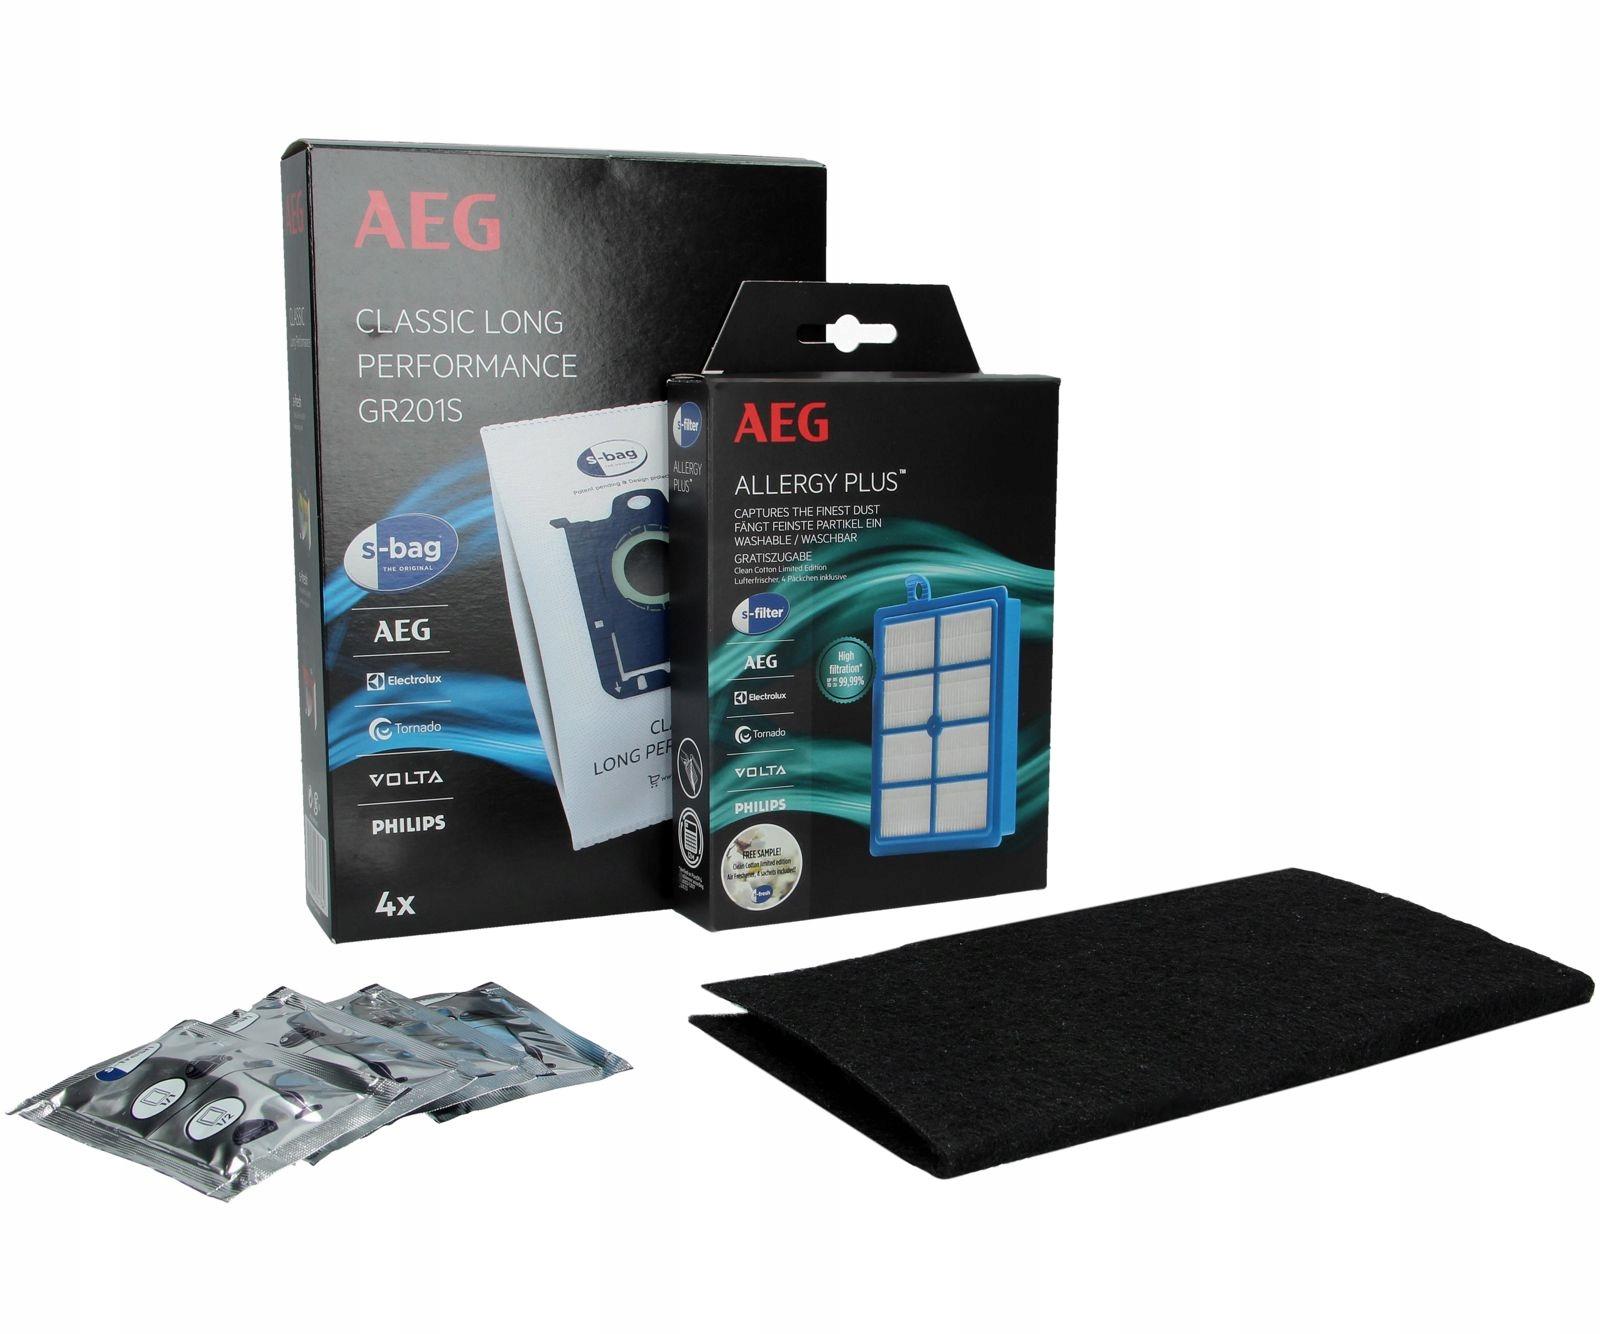 SYNTETICKÁ taška S-BAG 4 ks. + HEPA filter EFS1W